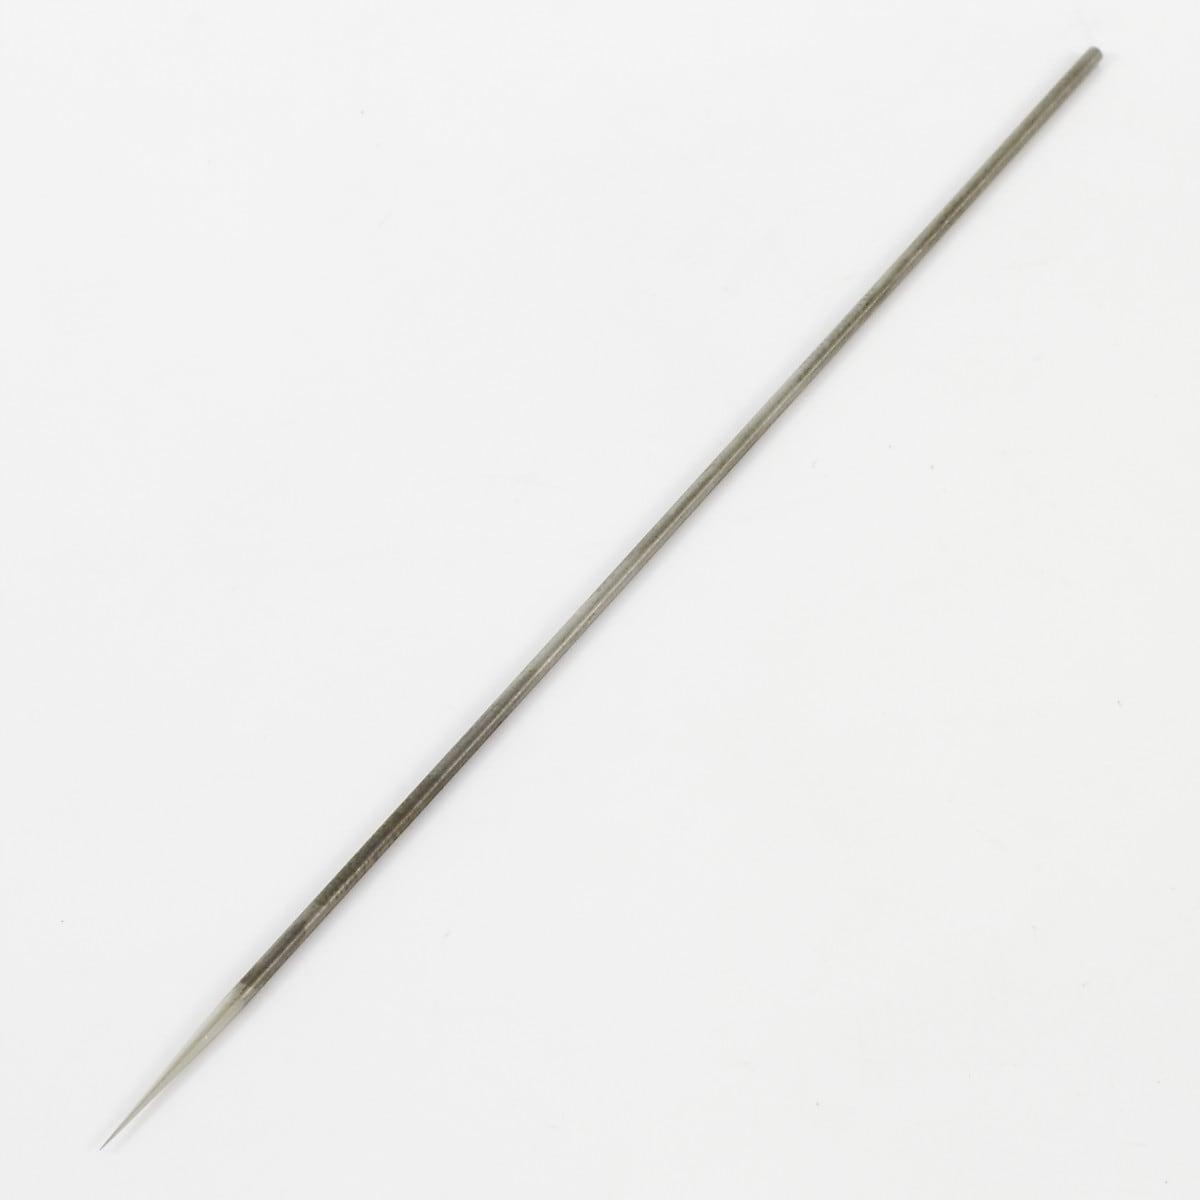 Nadel 1,2 mm